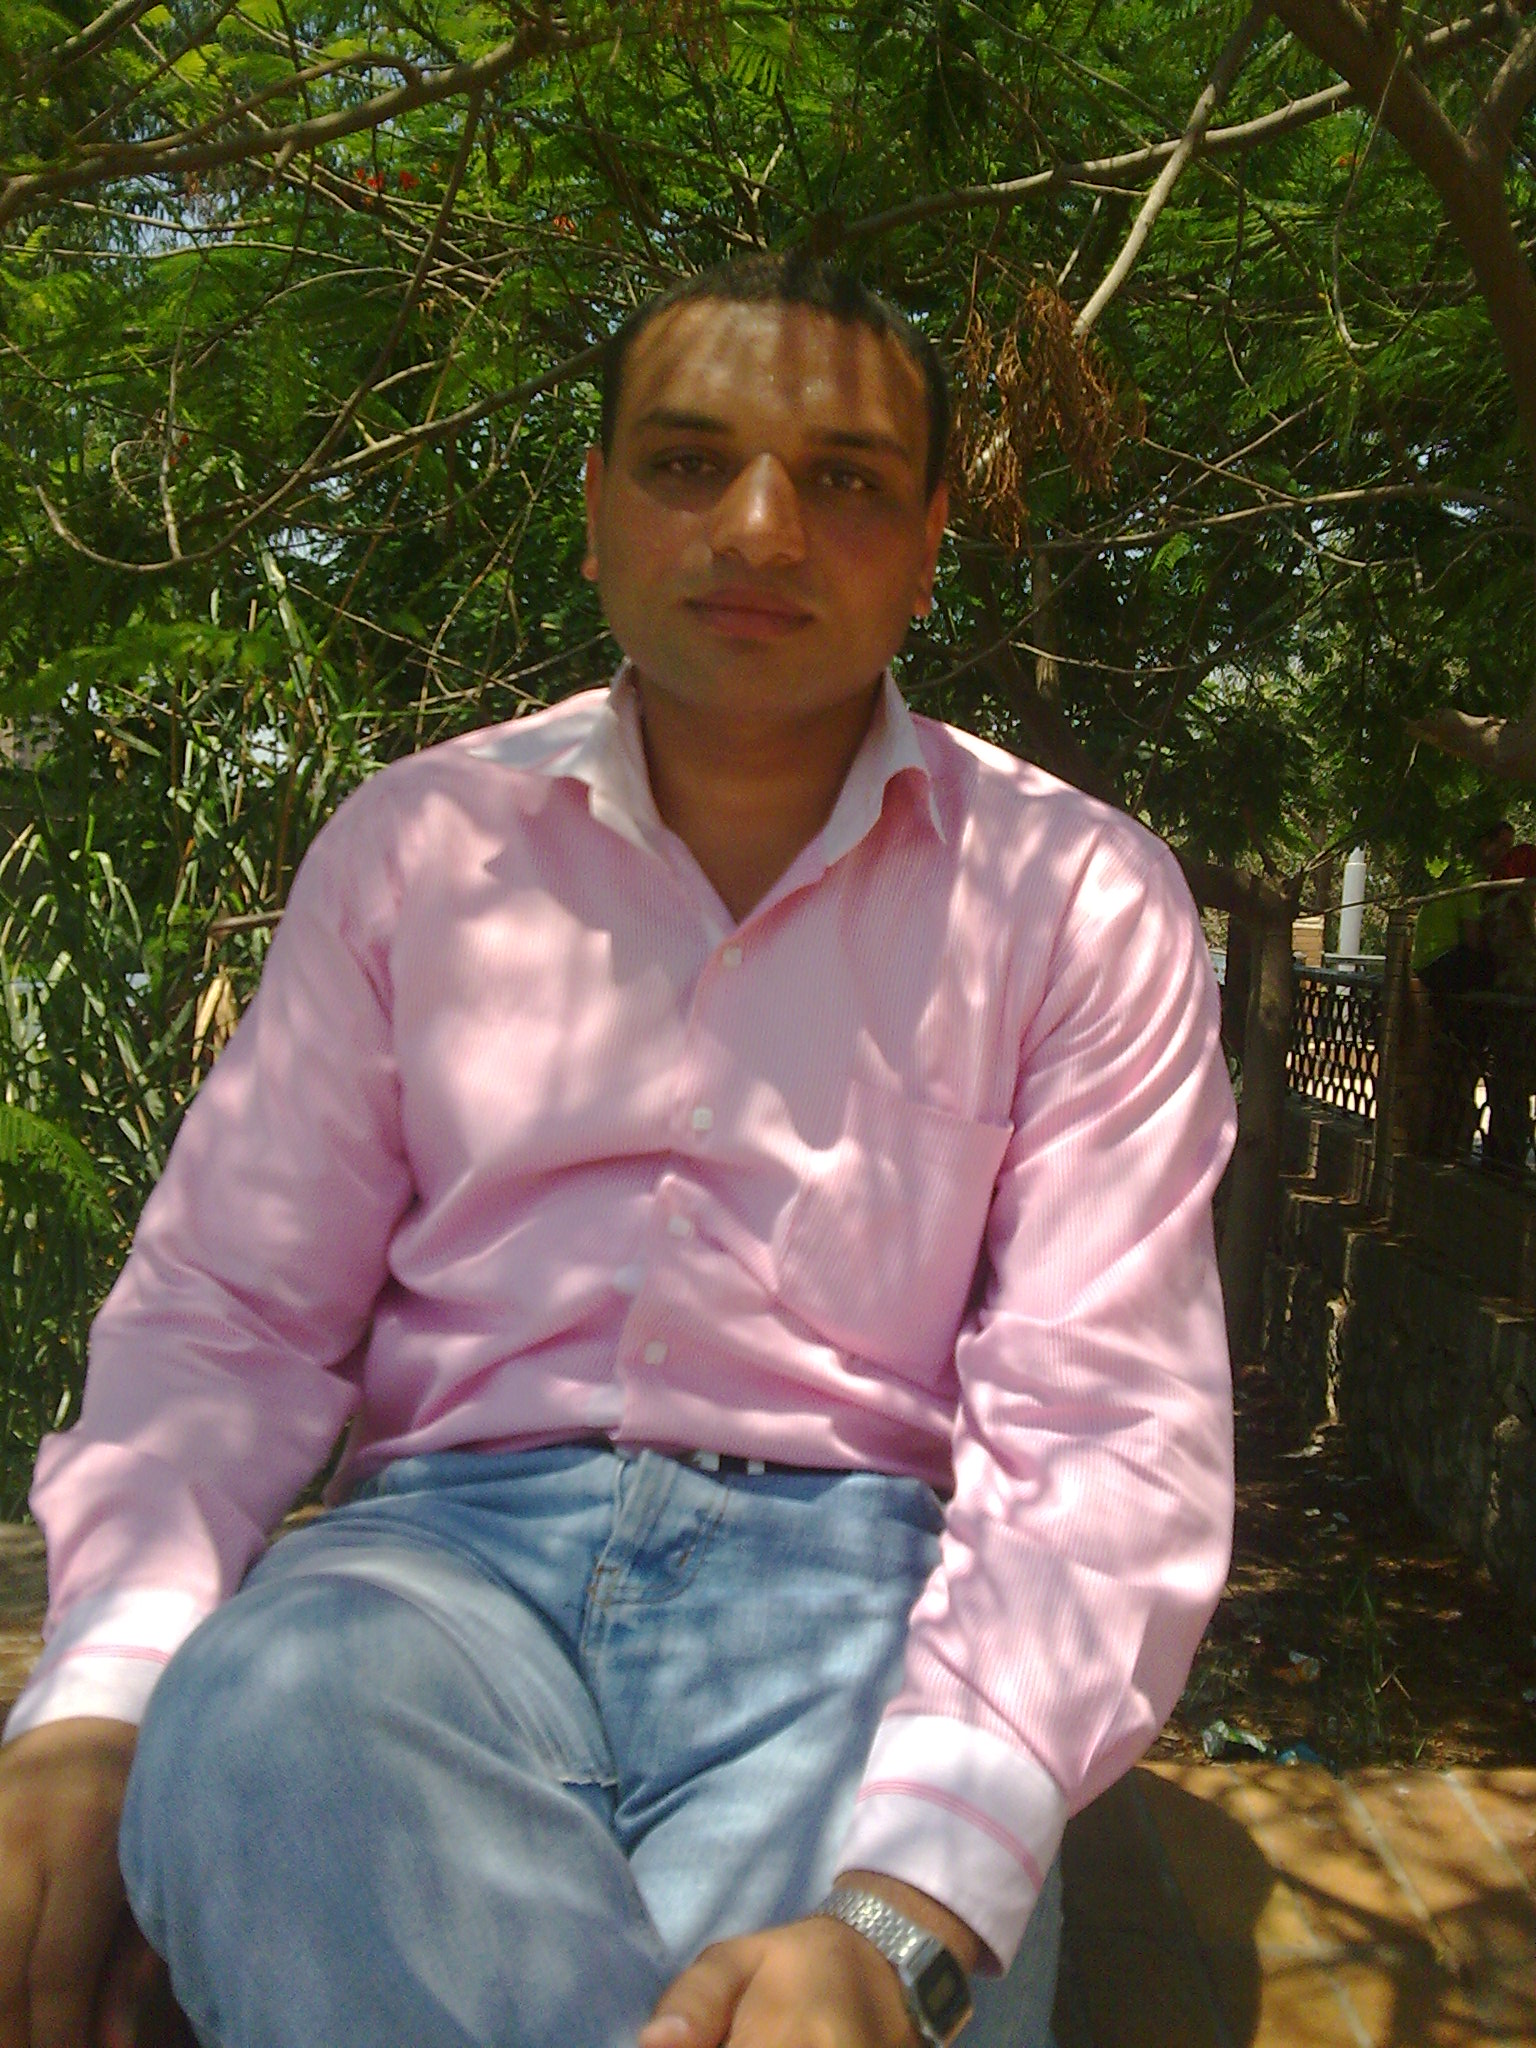 Ahmed Abed Ibrahim Abdelmotaleb